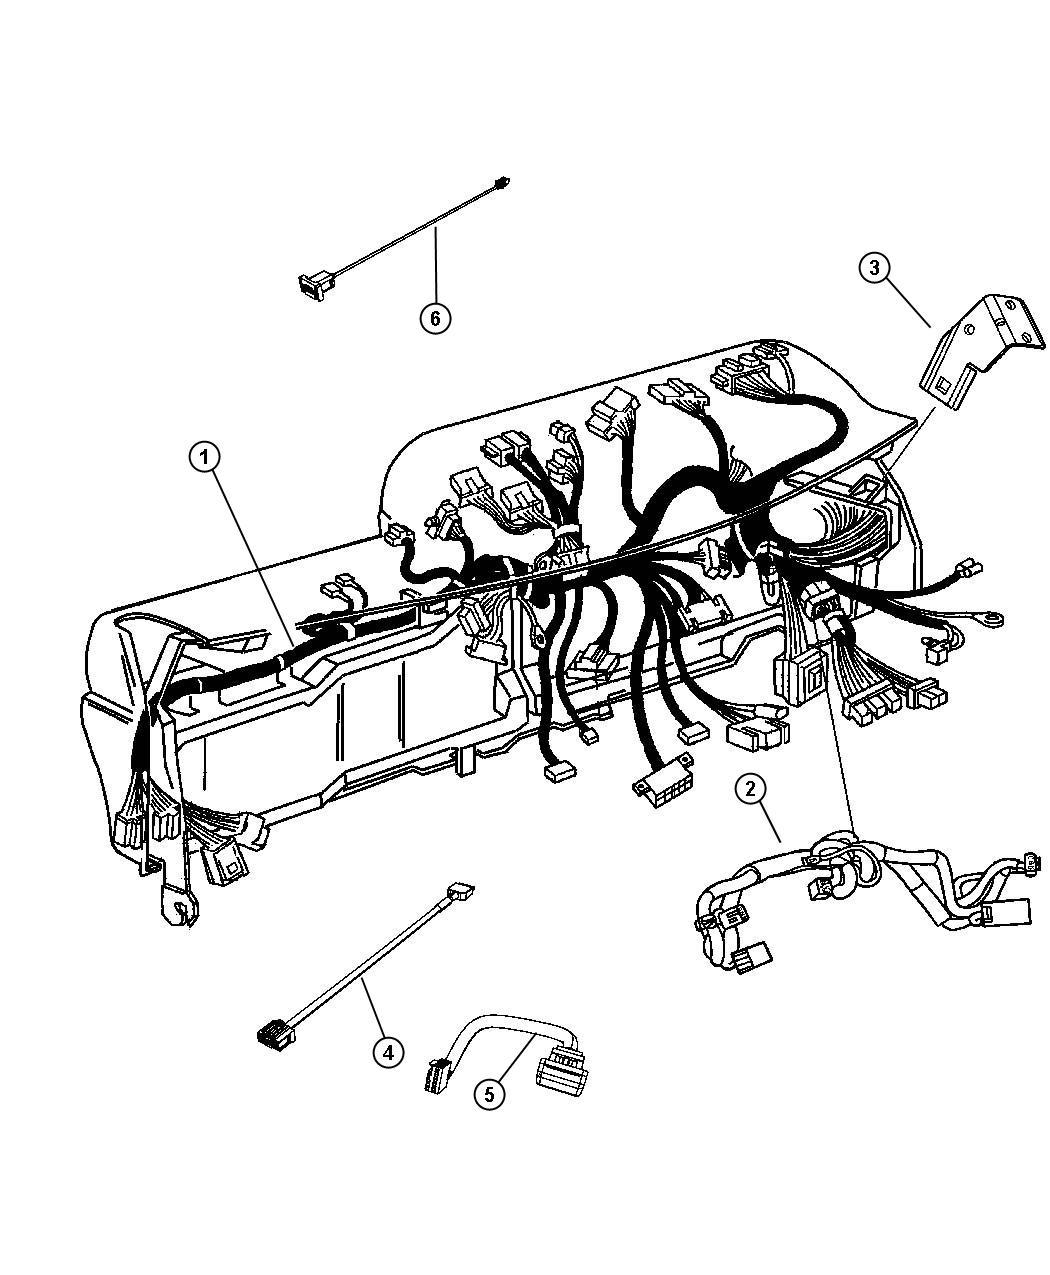 Dodge Ram 5500 Wiring. Jumper. Telematics module